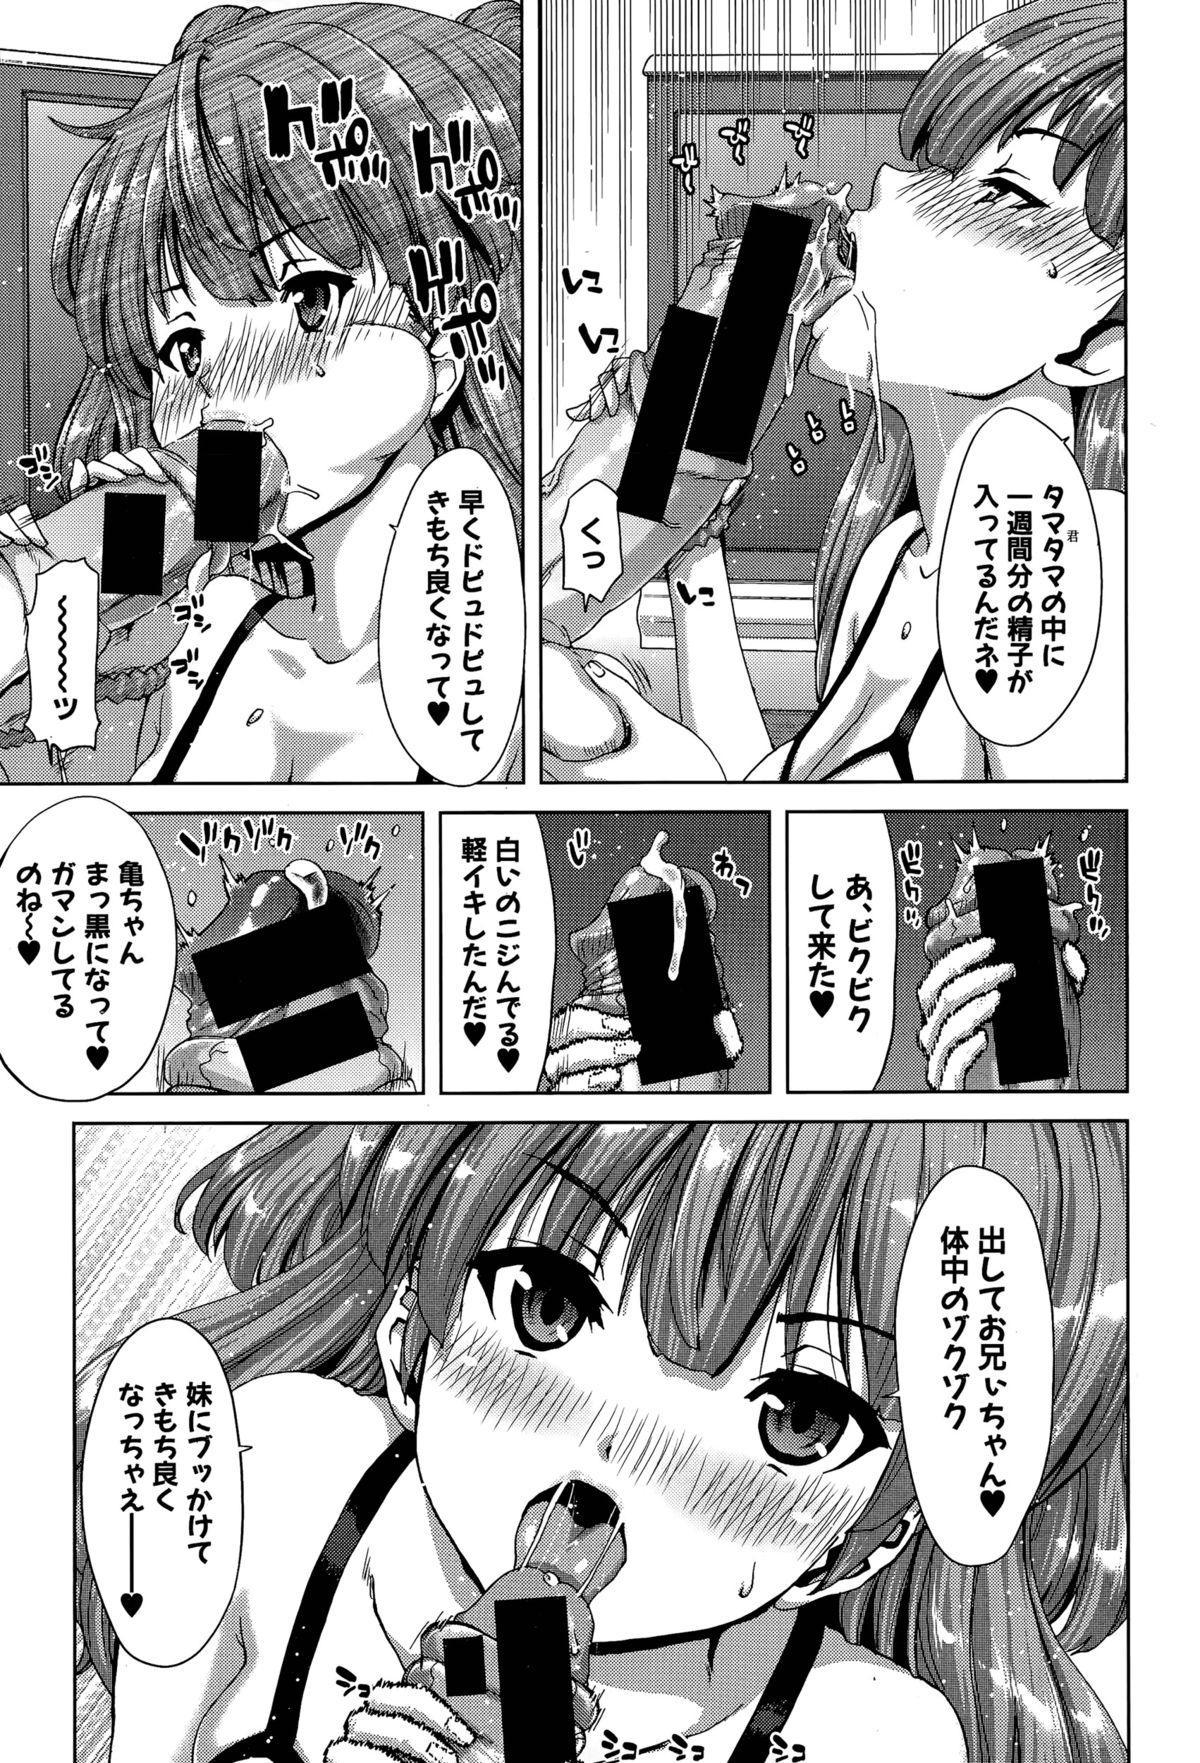 Imouto Sei Shoudou Ch. 1-2 6